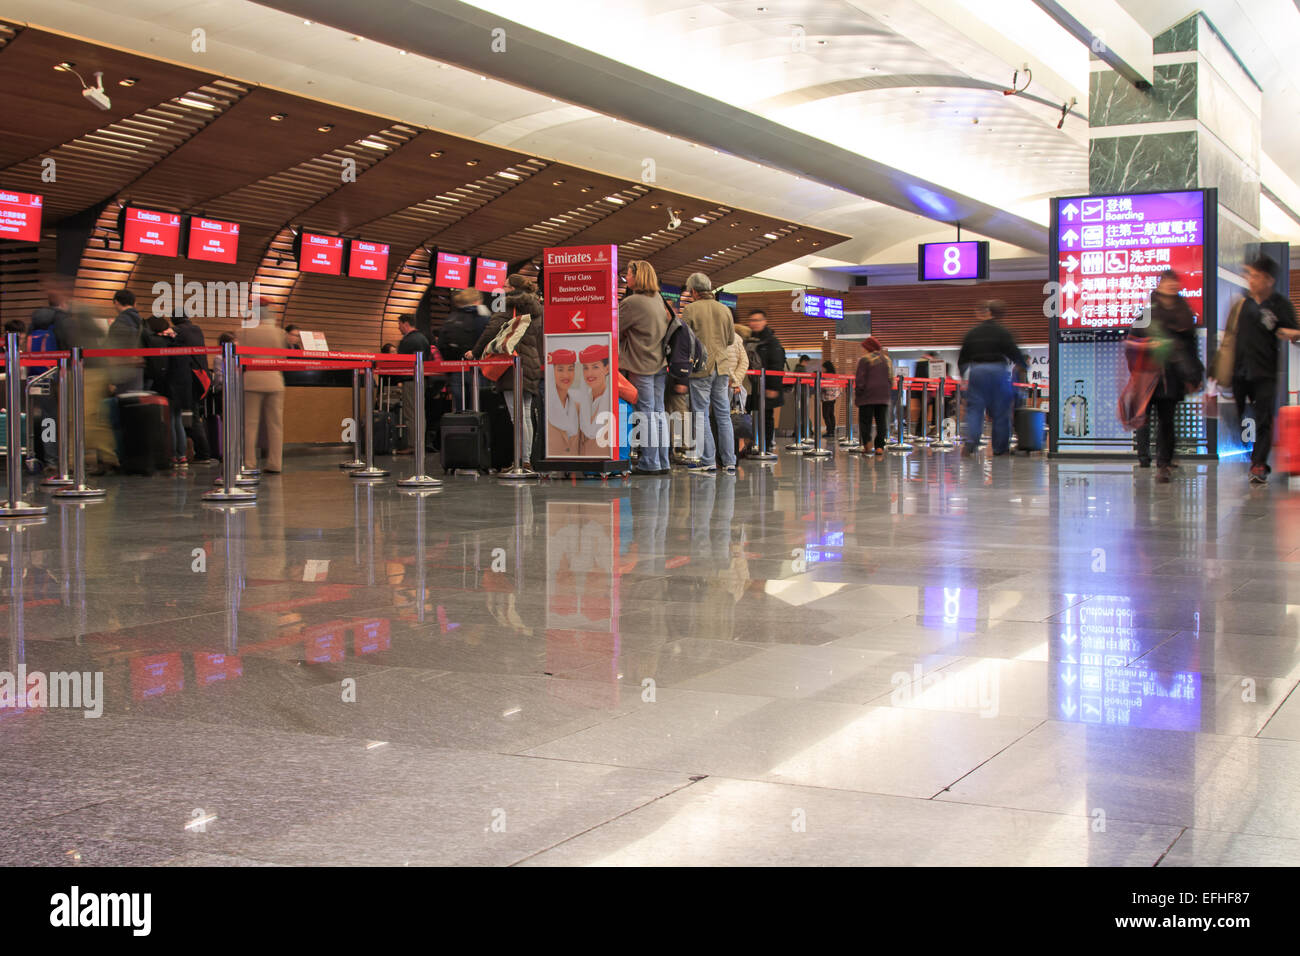 Taipei, Taiwan - January 9, 2015: People at the Emirates counters inside the Taiwan Taoyuan International Airport, - Stock Image